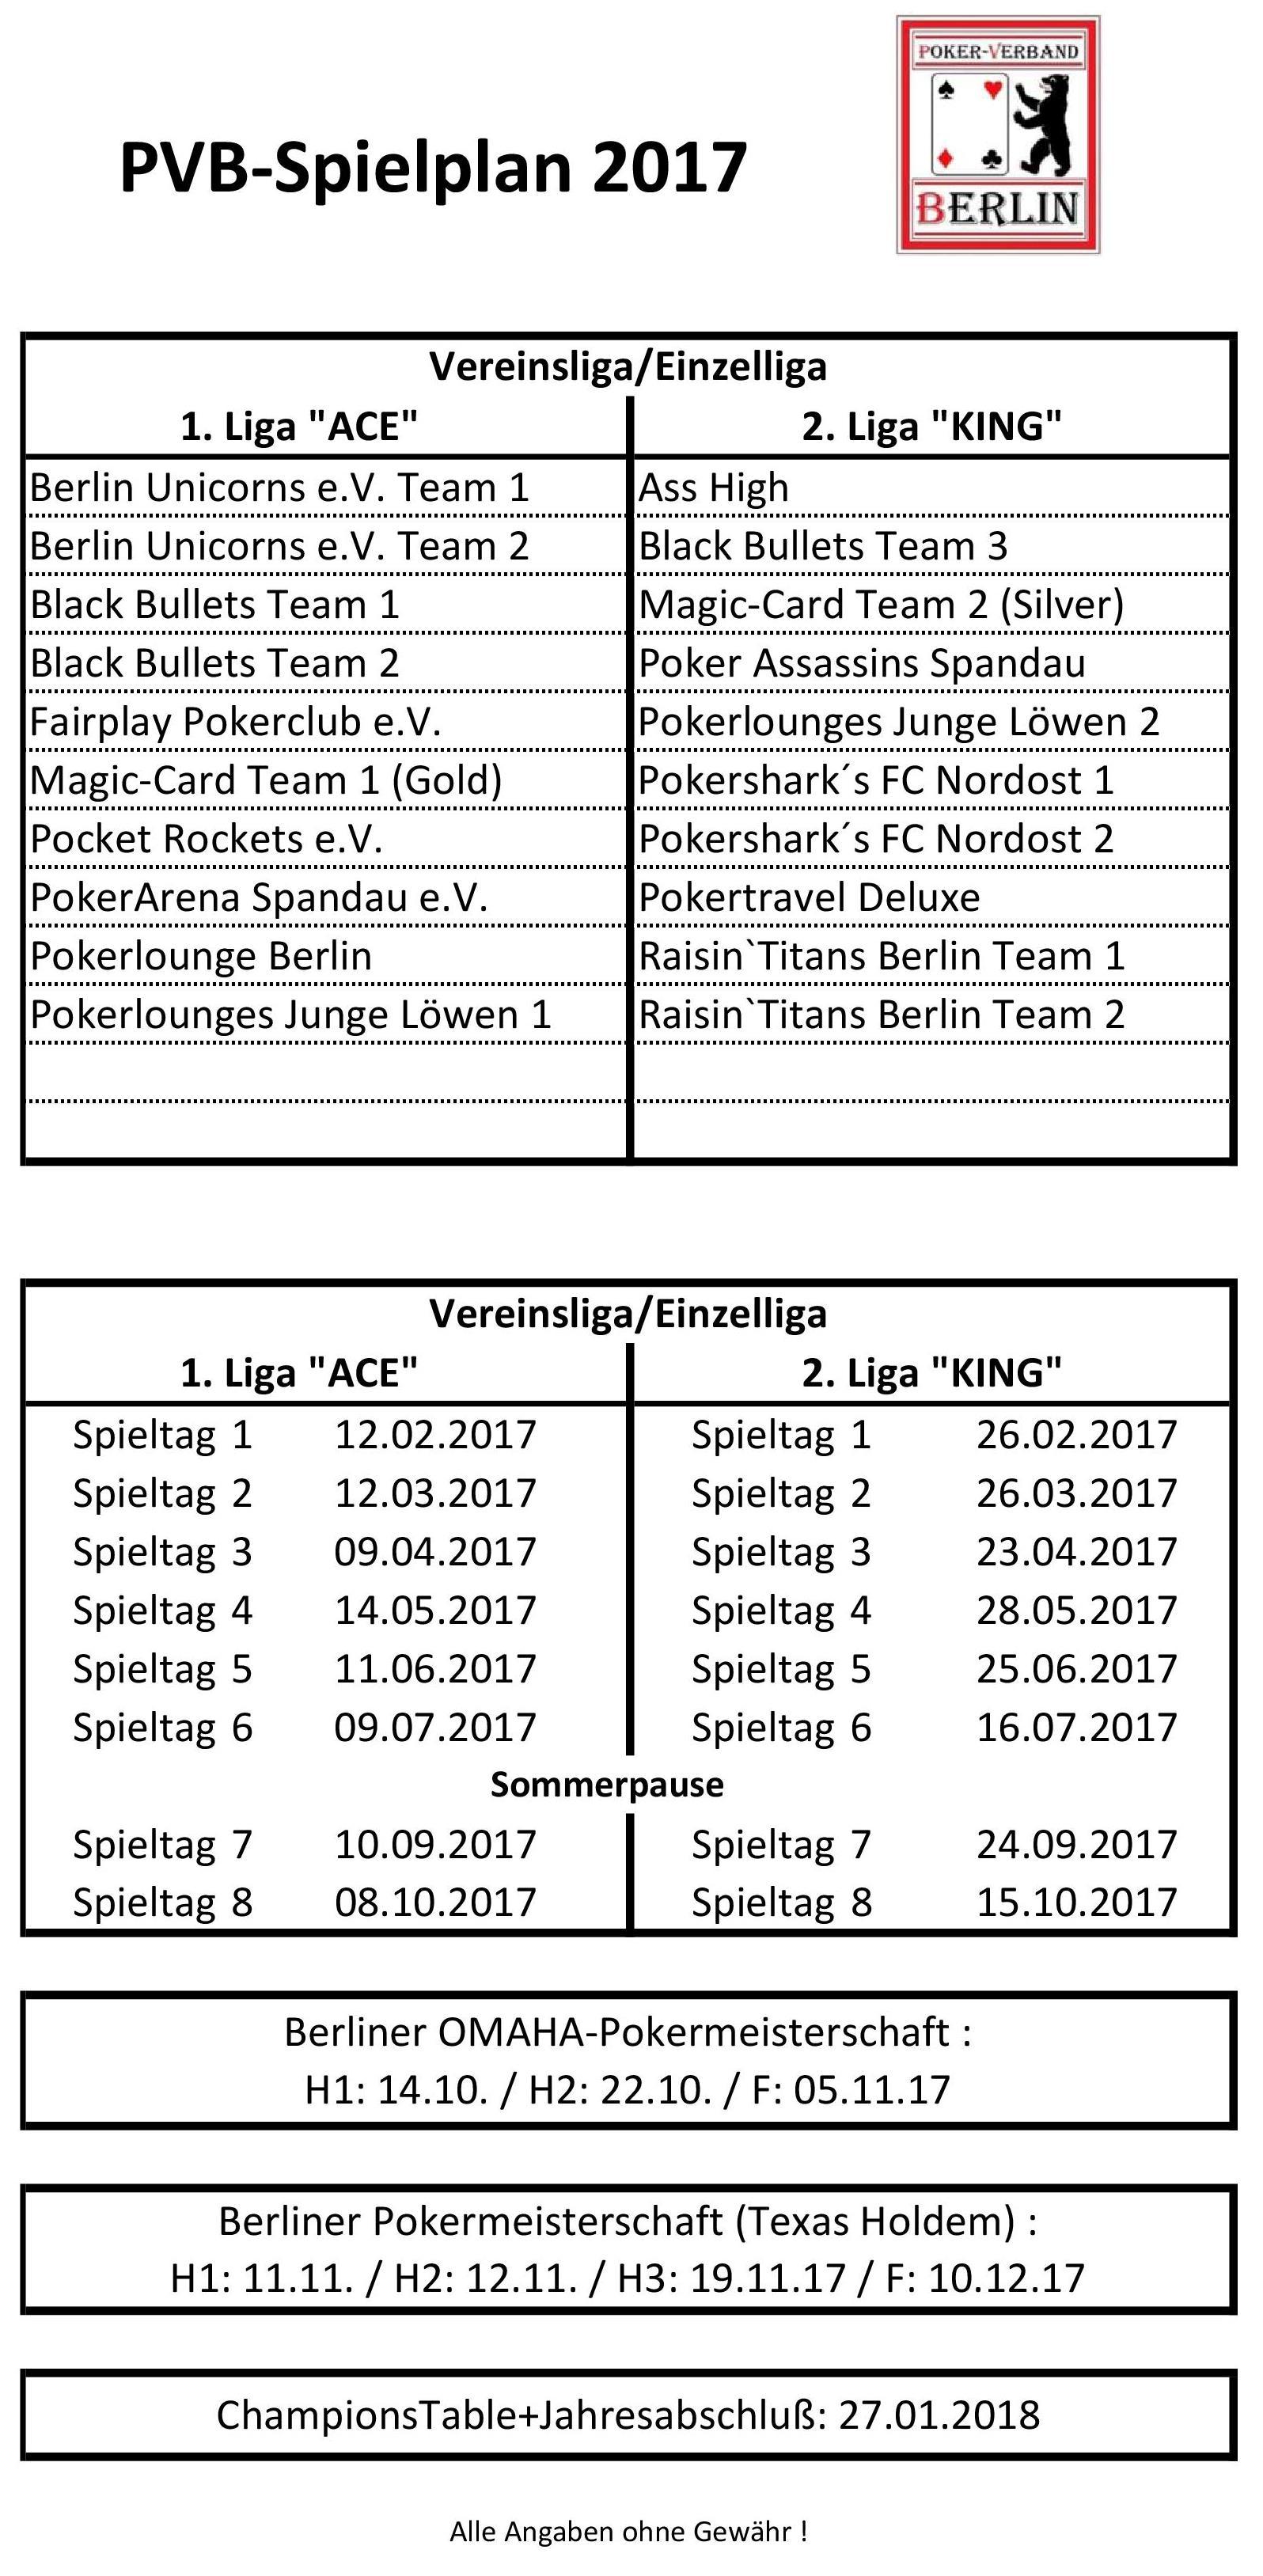 PVB-Spielplan 2017